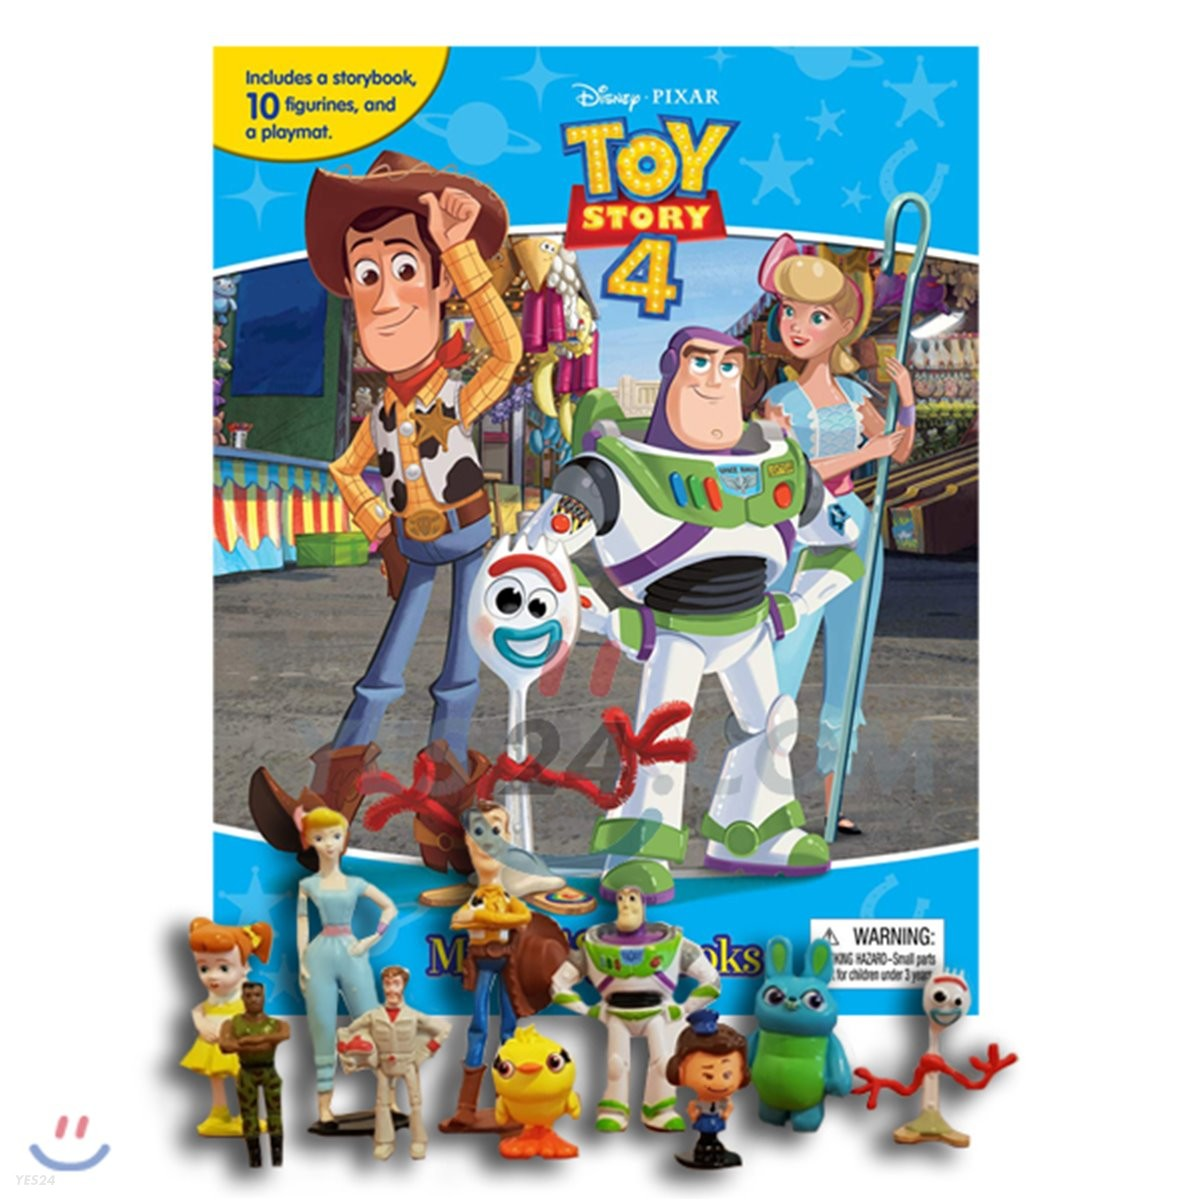 Disney Pixar Toy Story 4 My Busy Book 디즈니 픽사 토이스토리 4 비지북 피규어 책